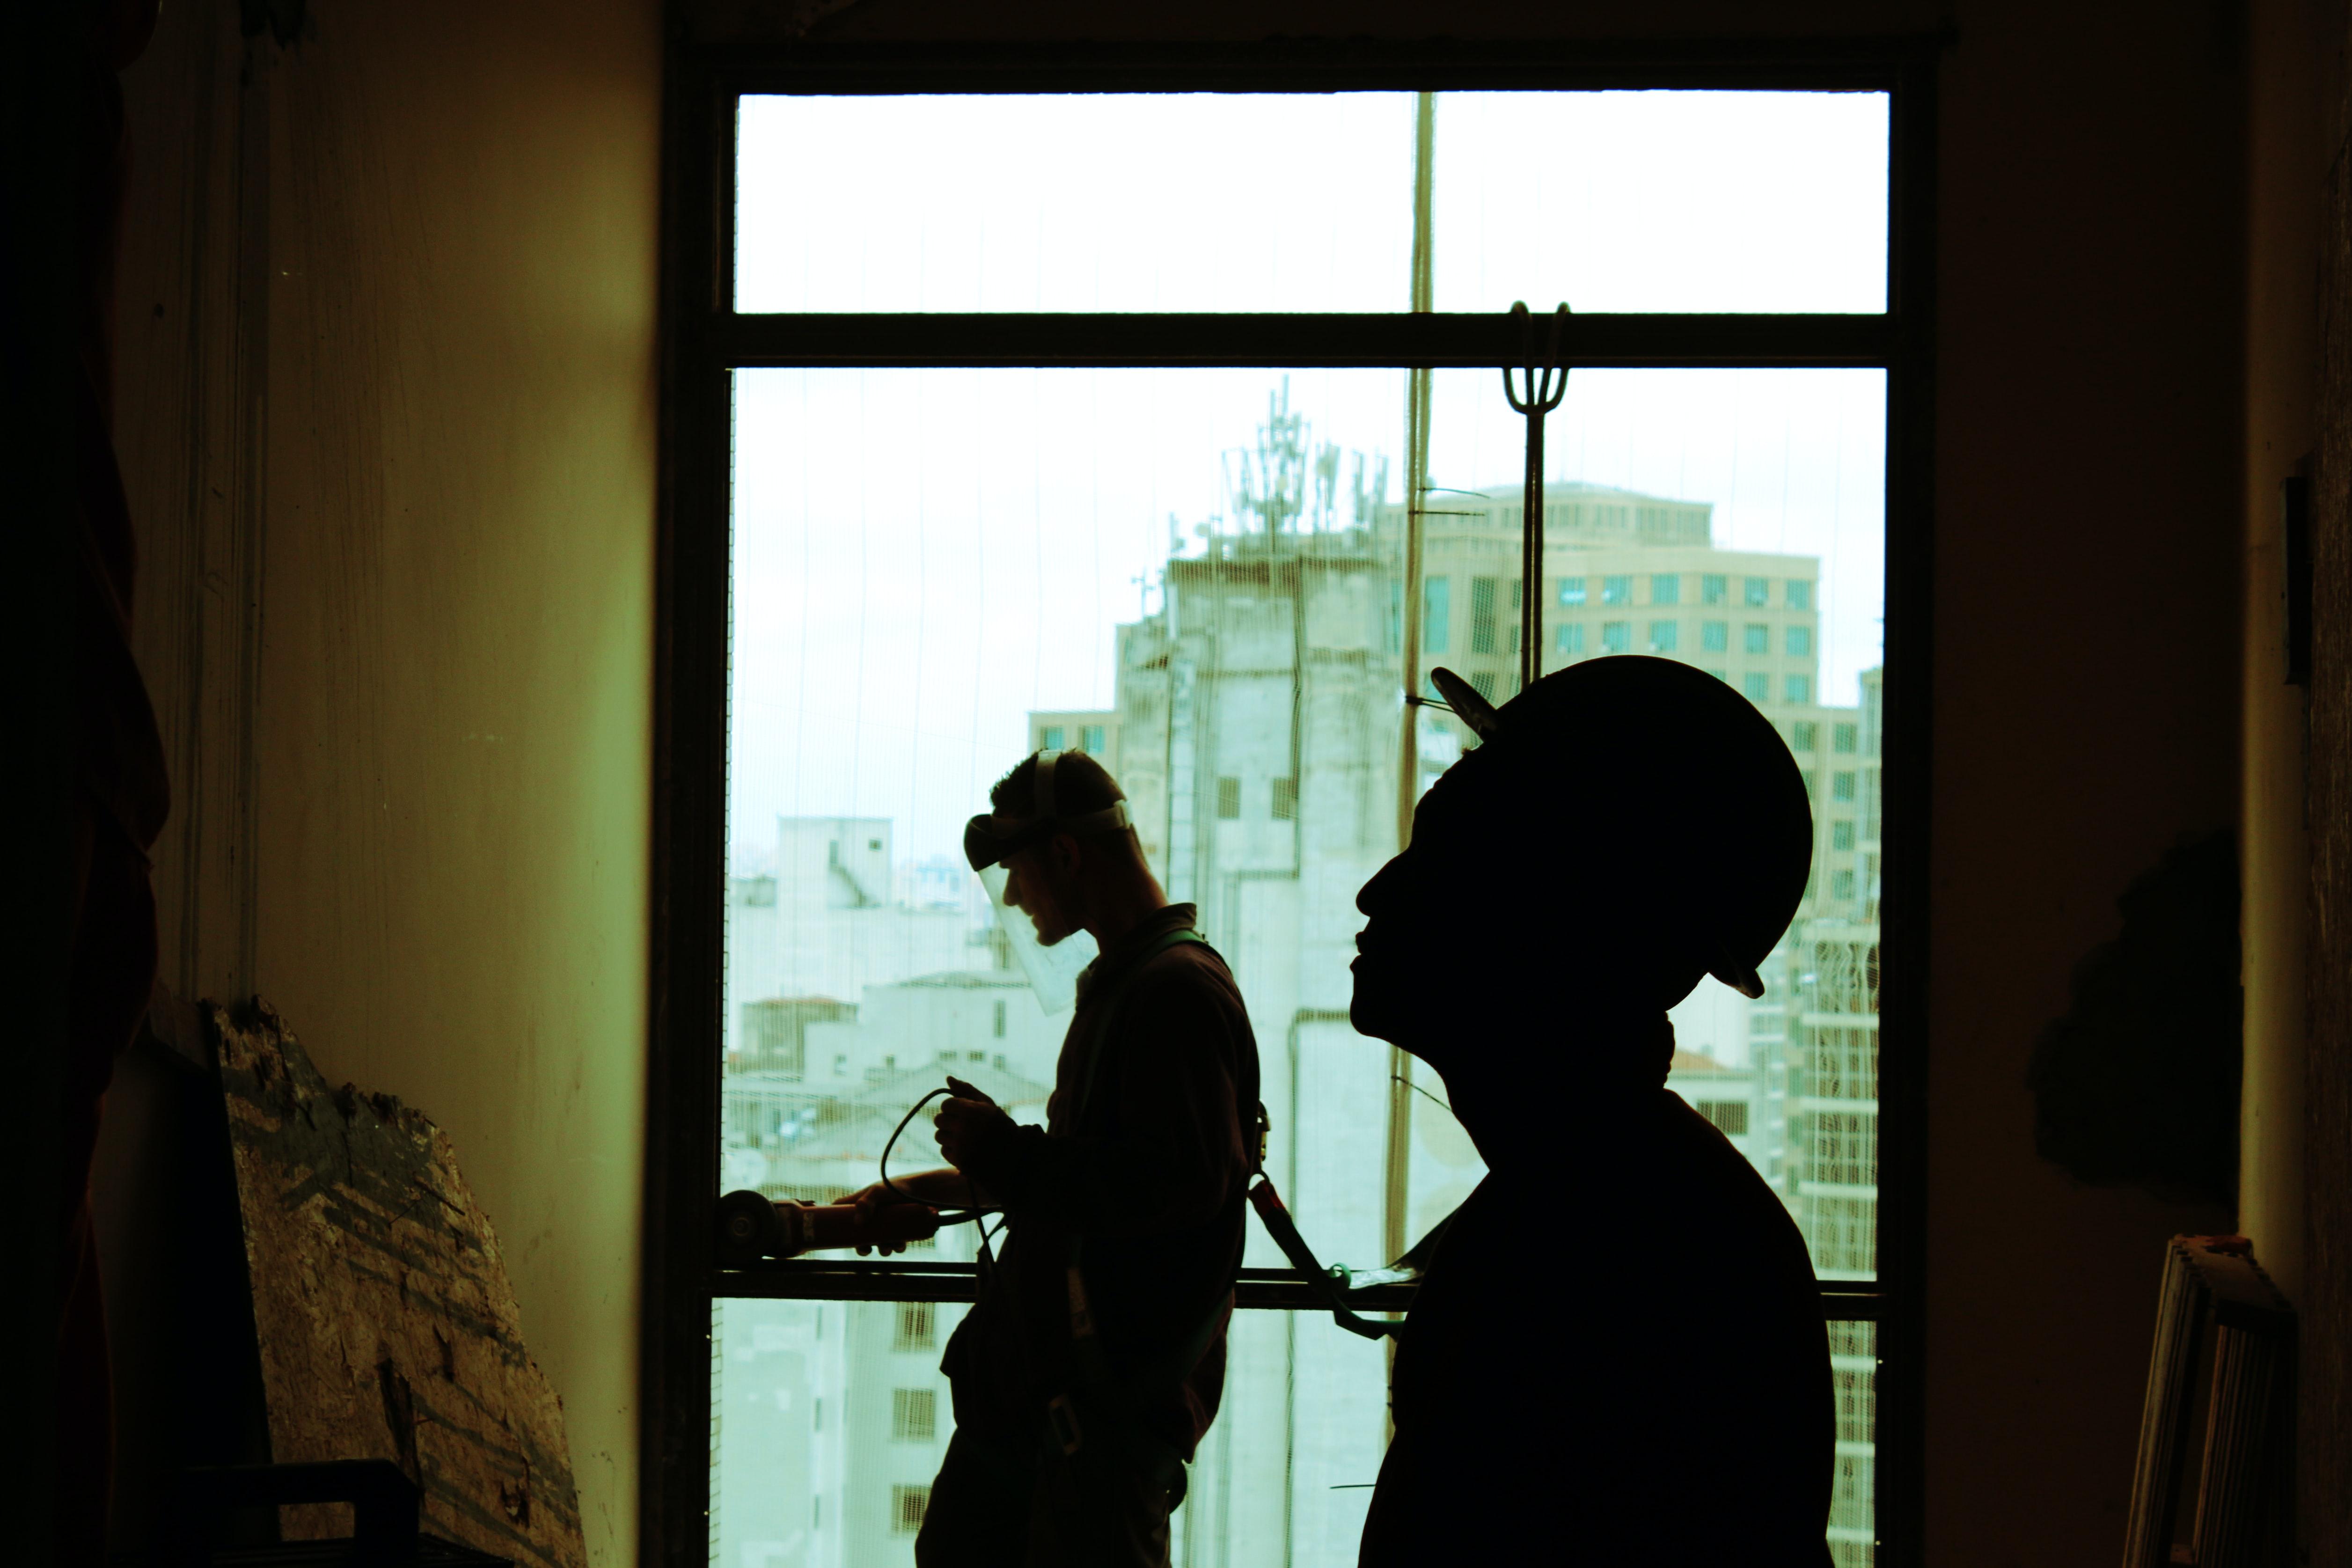 [Hard] Hats Off to Ritsema Associates for National Construction Appreciation Week